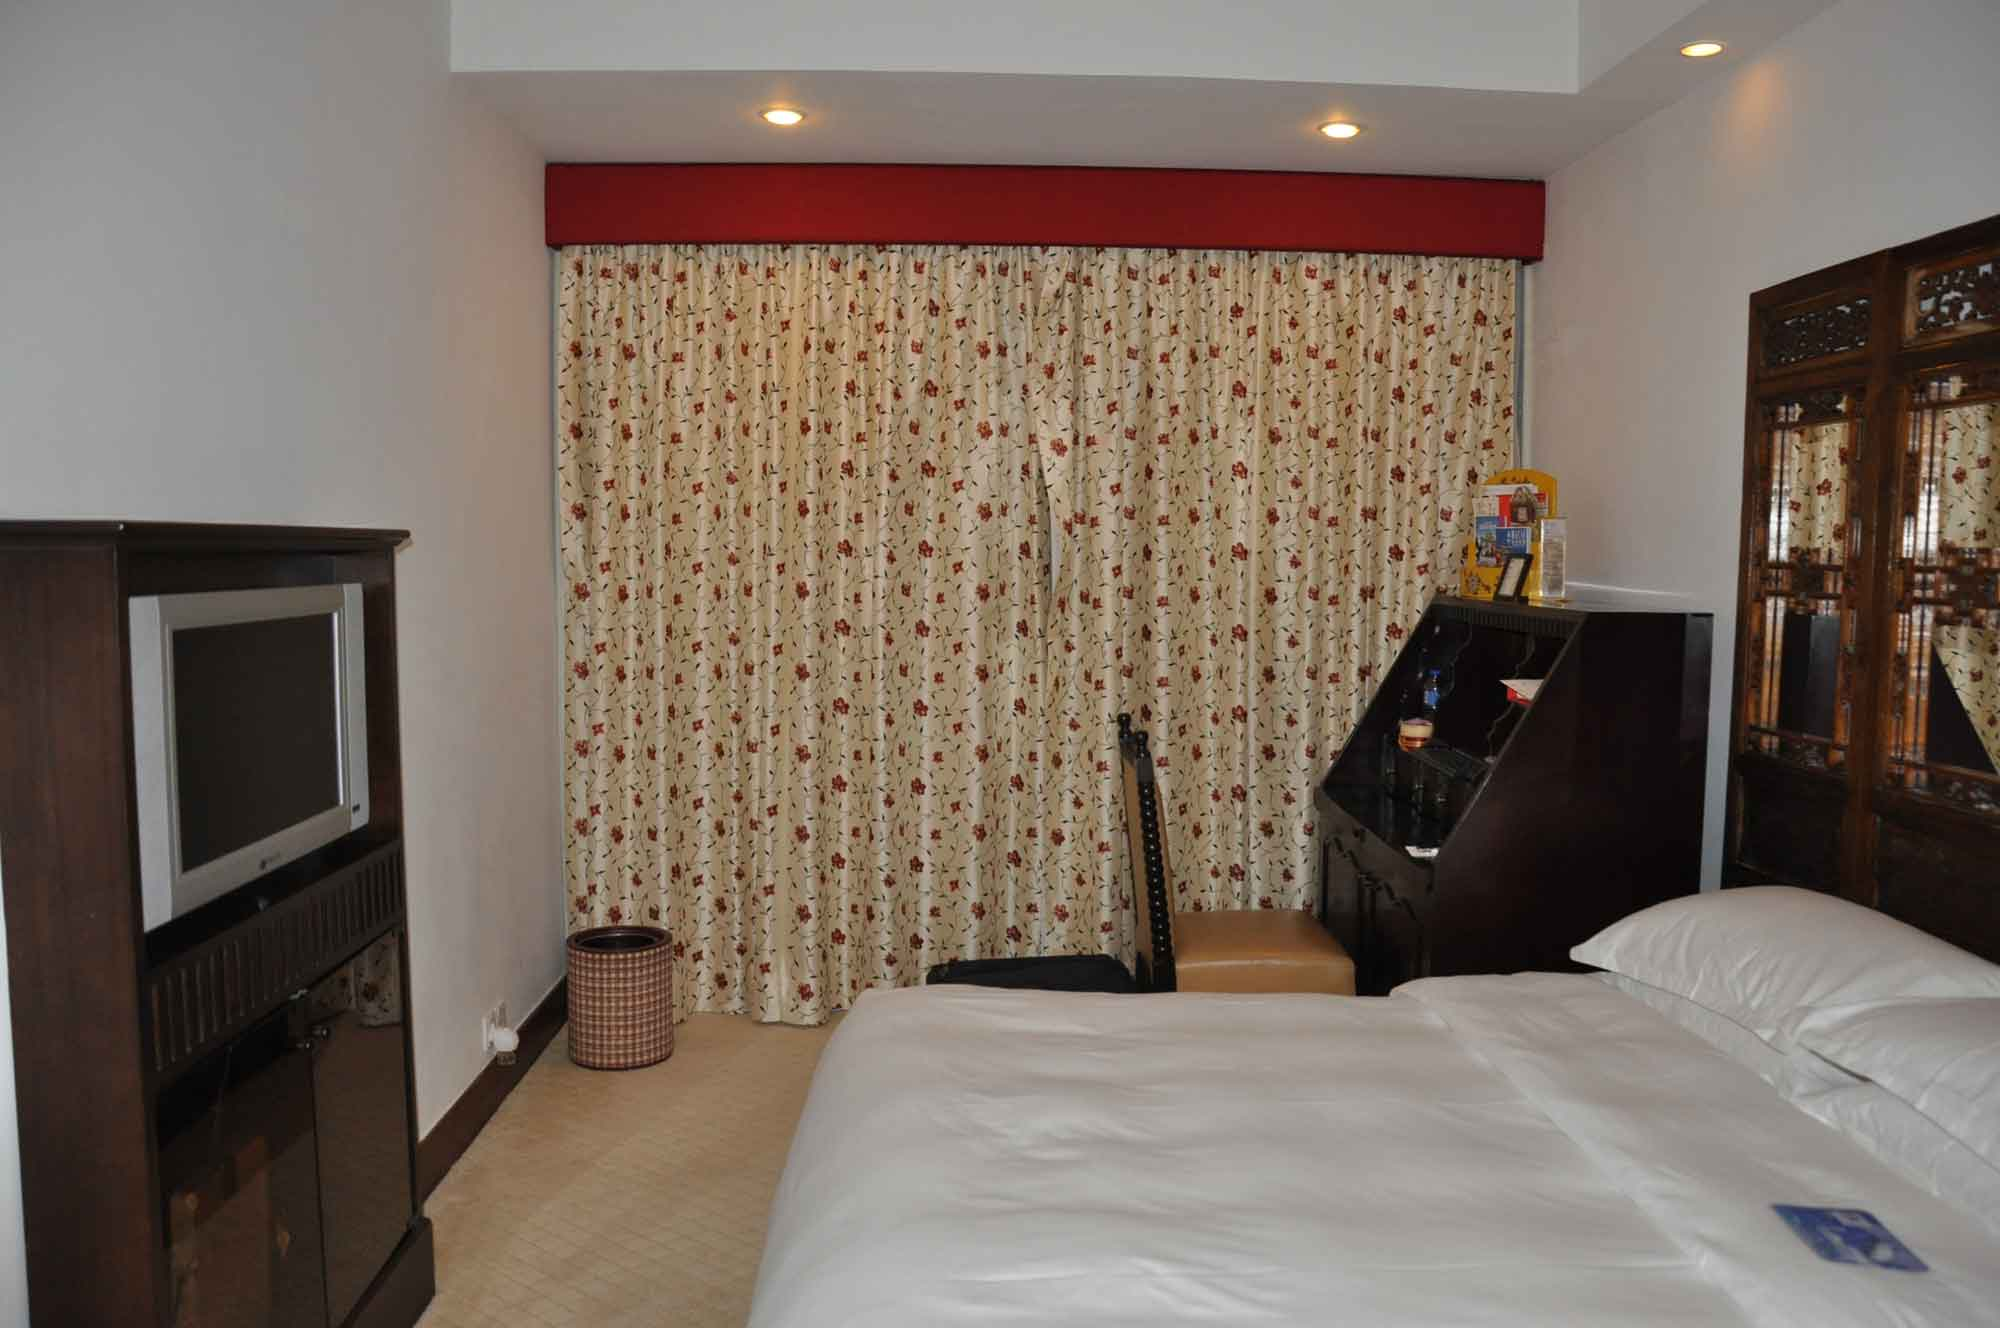 Pousada de Mong Ha Standard Room bed and TV